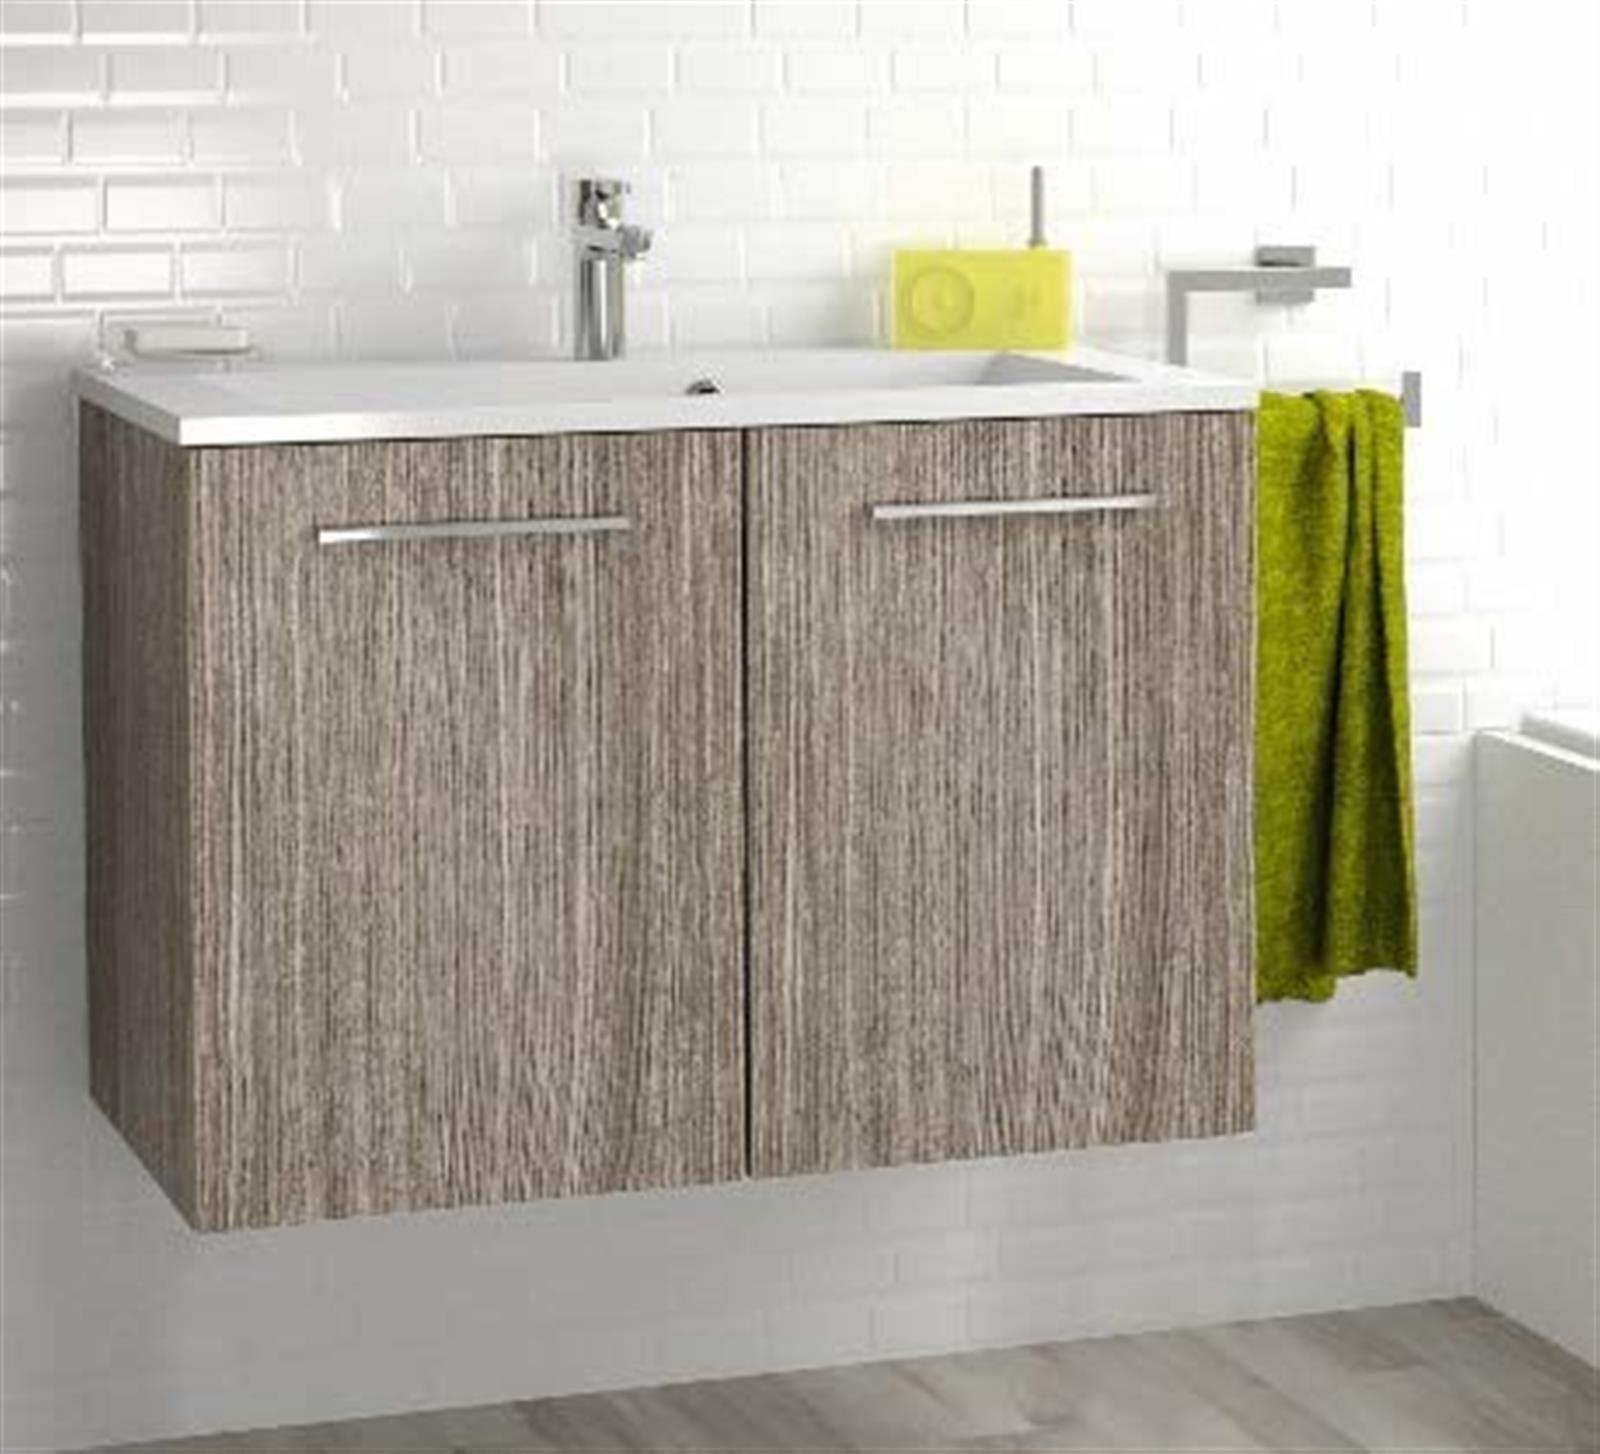 meuble sous vasque 2 portes 80 cm s rie adesio 3 sanitaire distribution. Black Bedroom Furniture Sets. Home Design Ideas